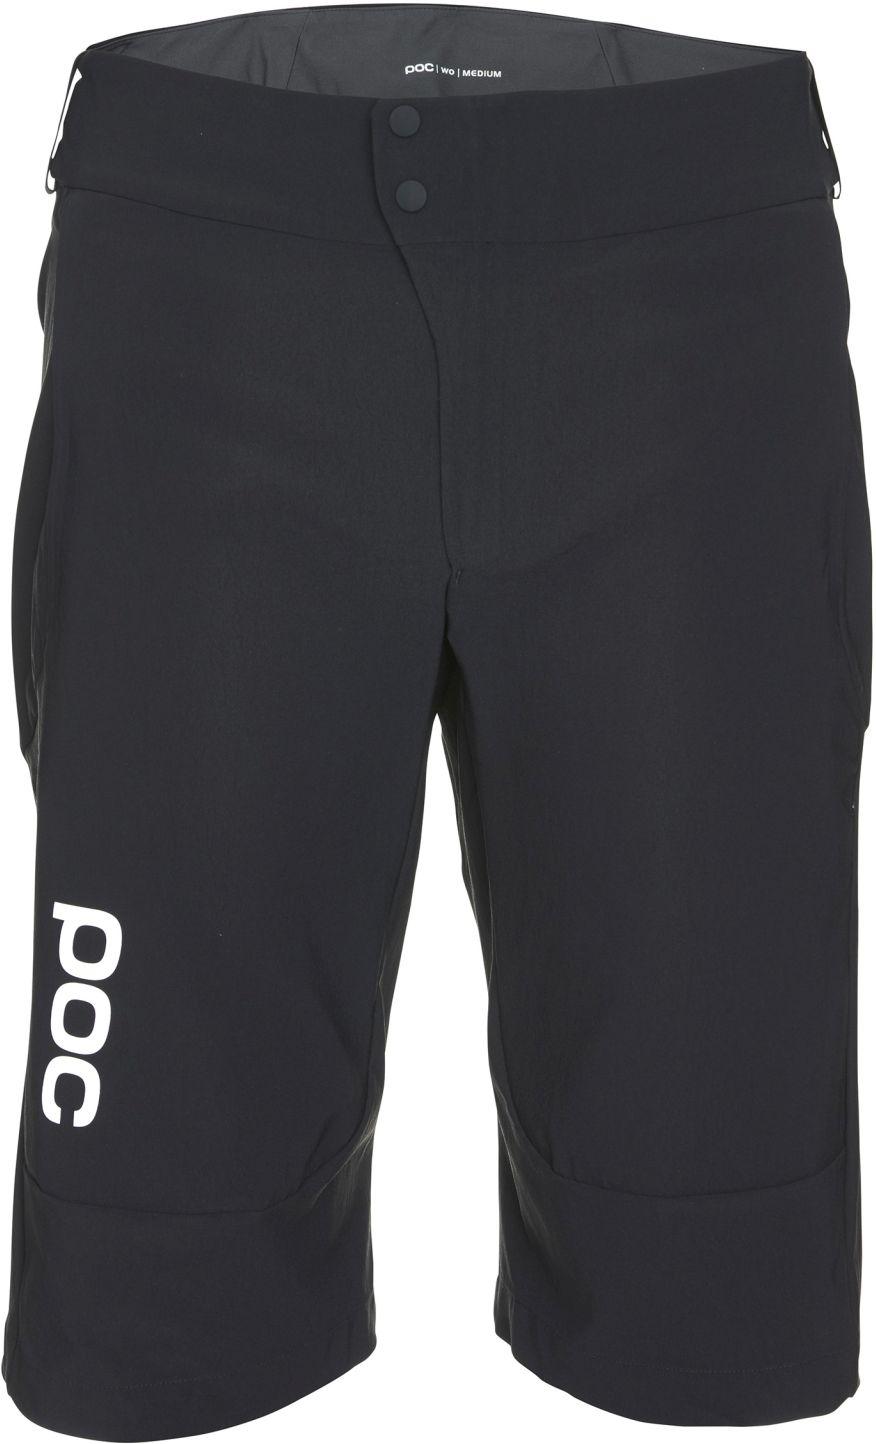 860d705f5c02 POC Essential MTB WO Shorts - uranium black S